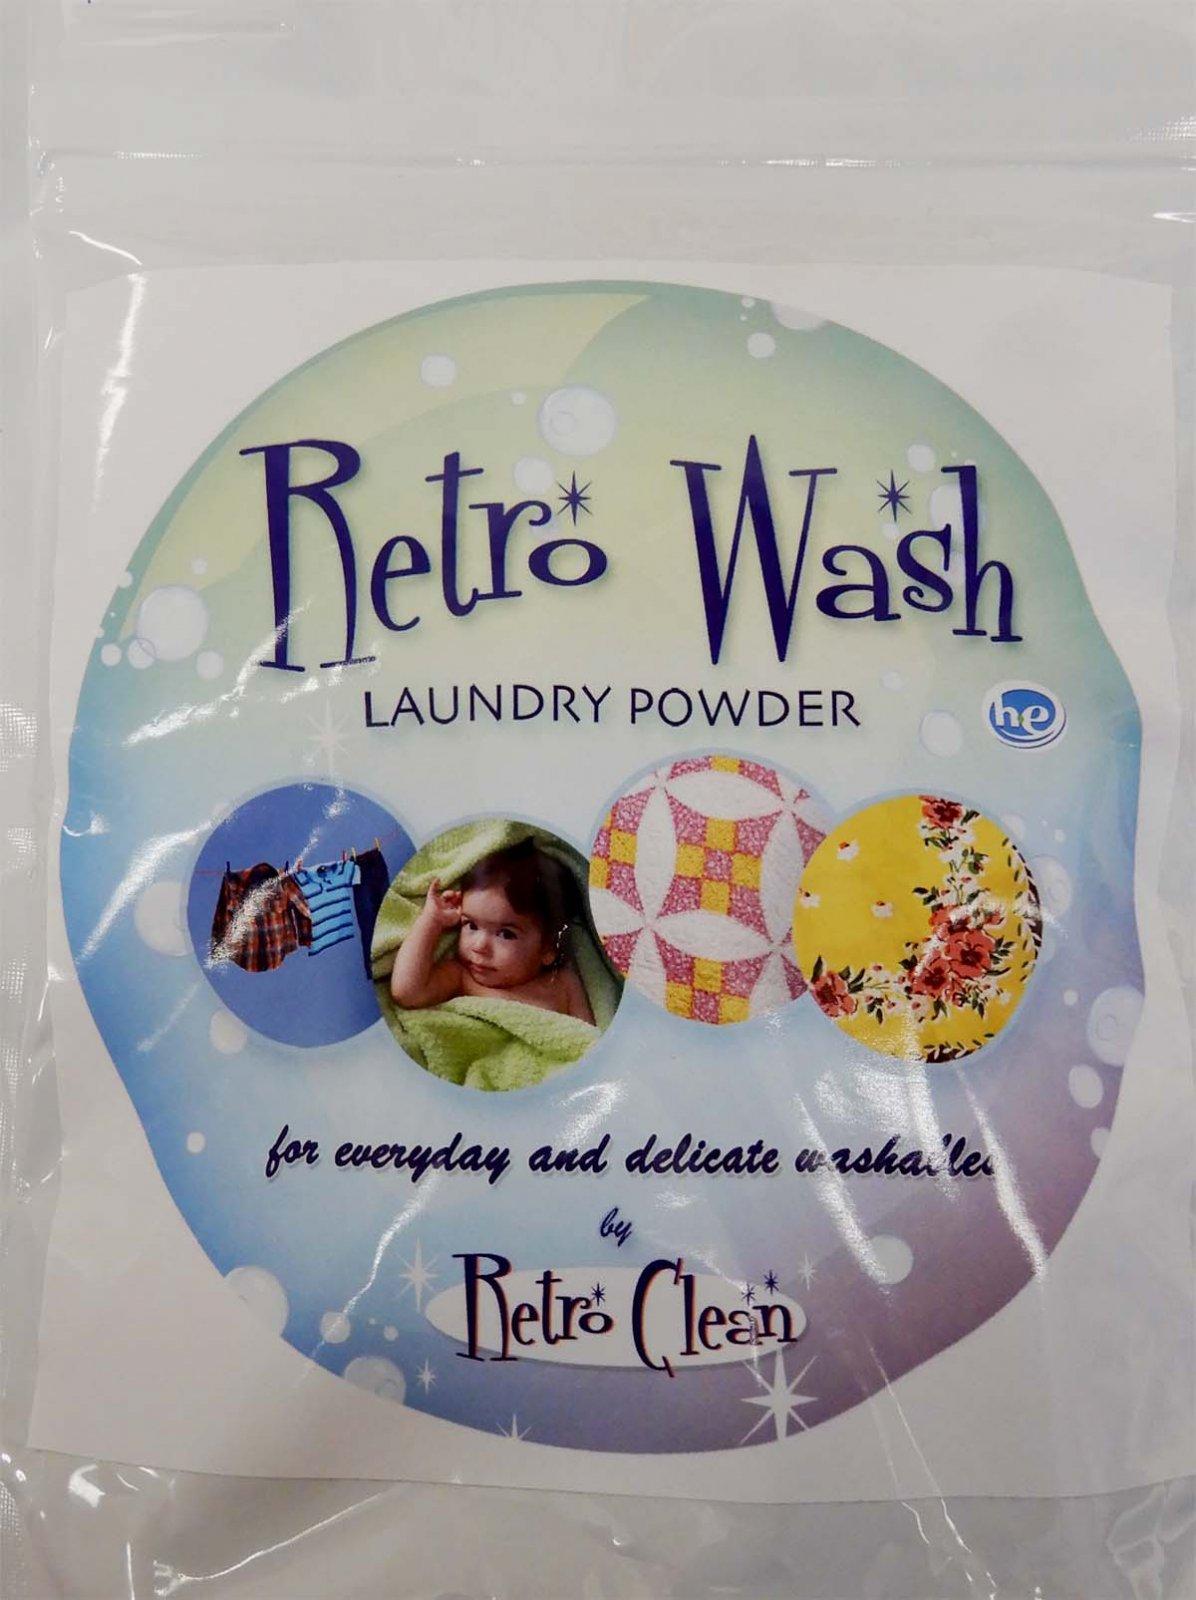 Retro Wash